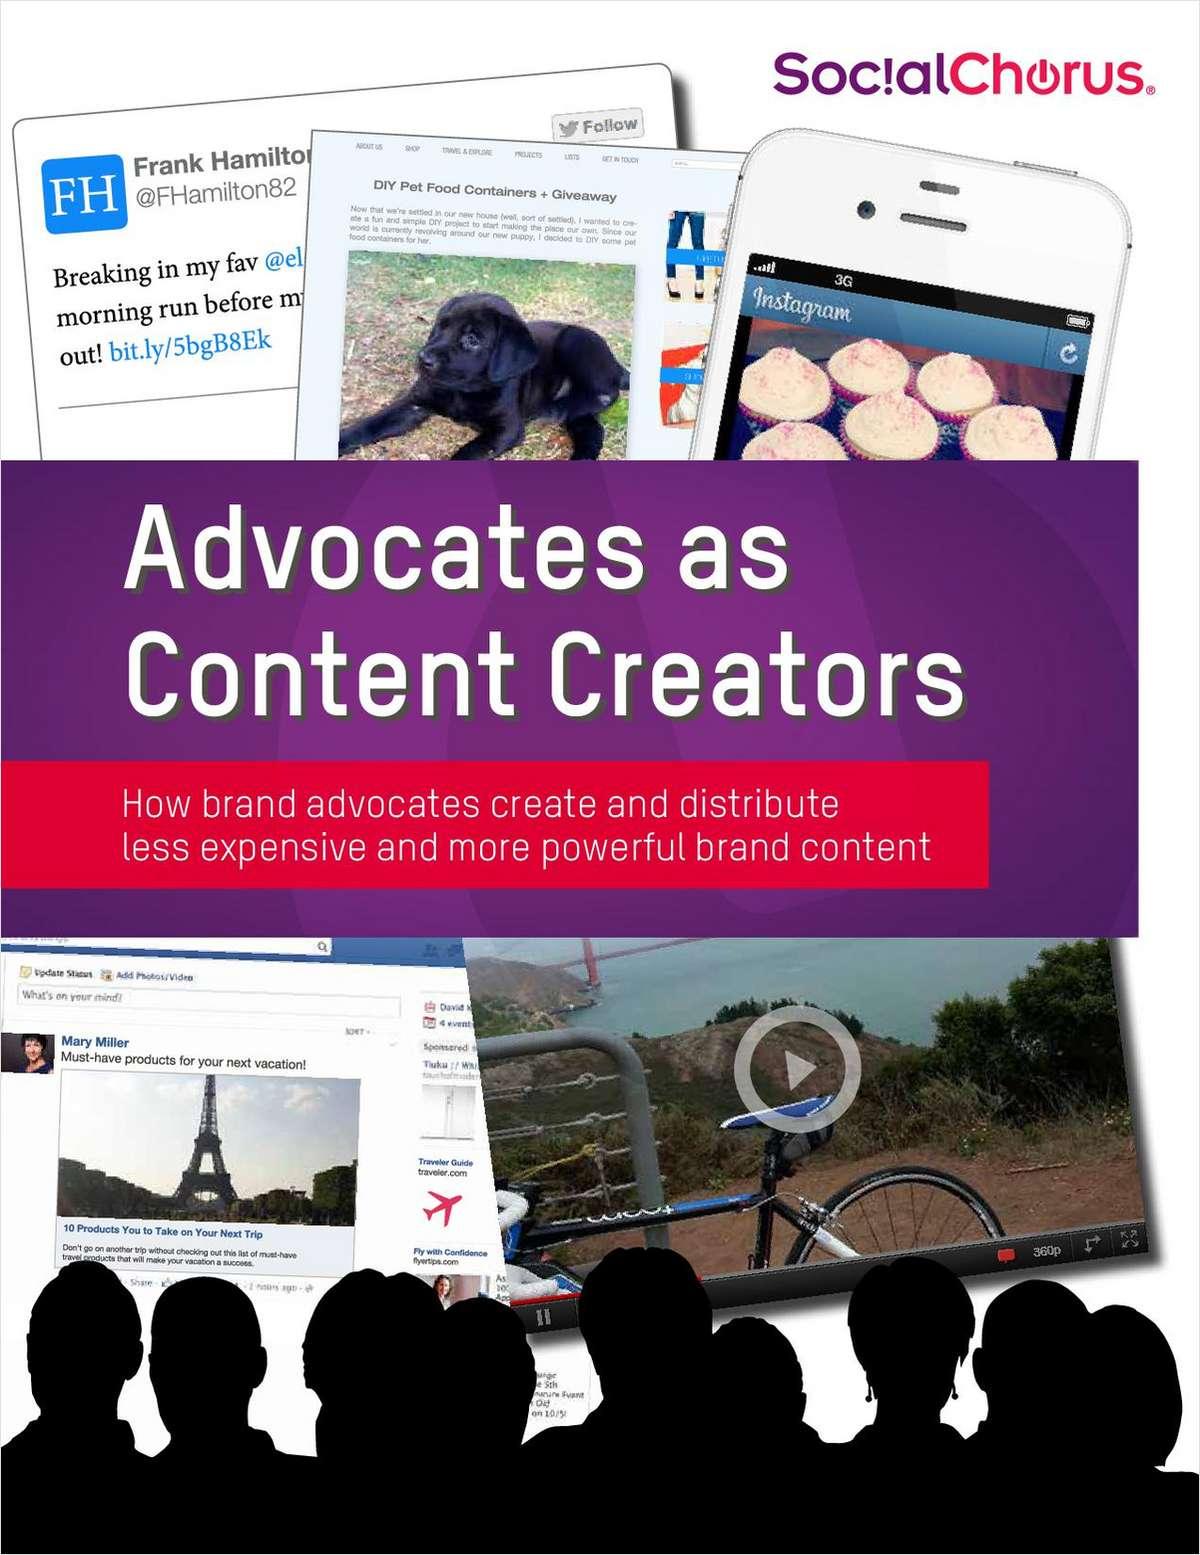 Power Brand Advocates to be Content Creators